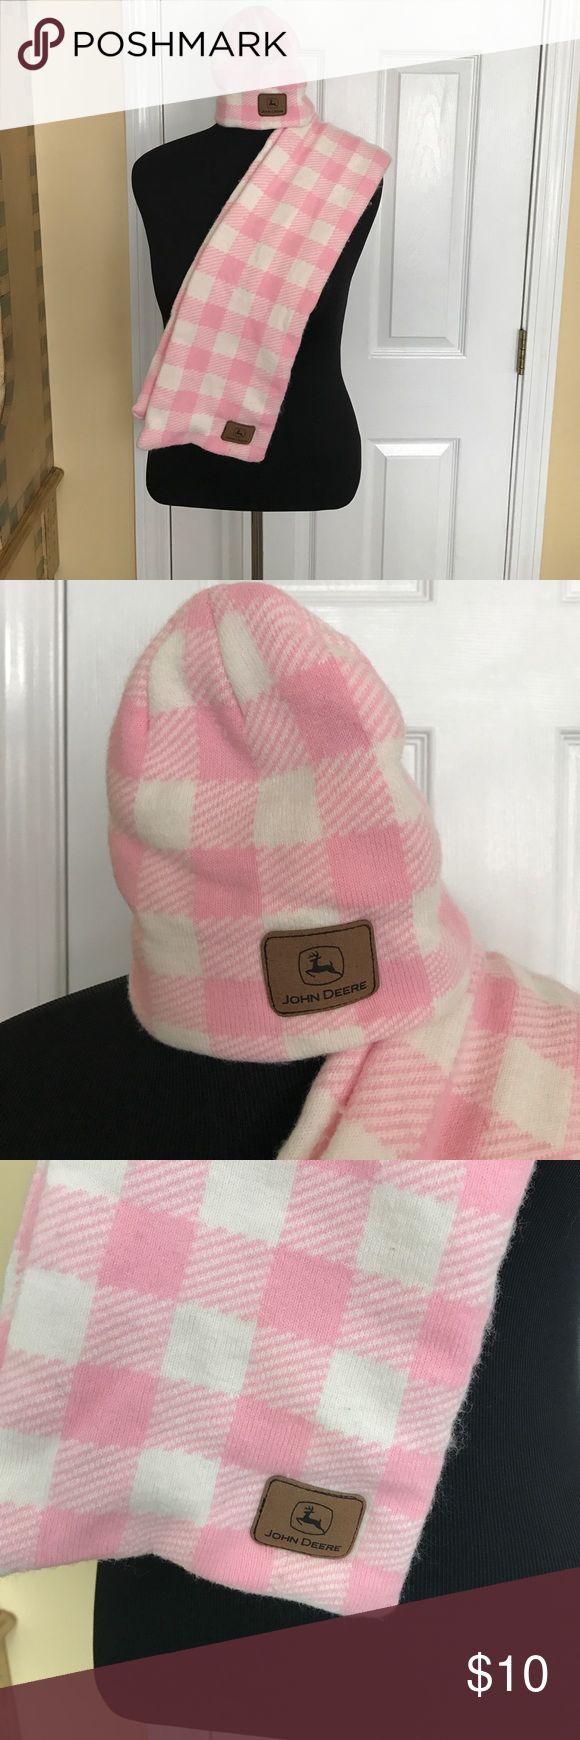 ❄️Winter Sale❄️ John Deere scarf & hat John Deere winter pink & white checkered scarf & matching hat set. John Deere Accessories Scarves & Wraps